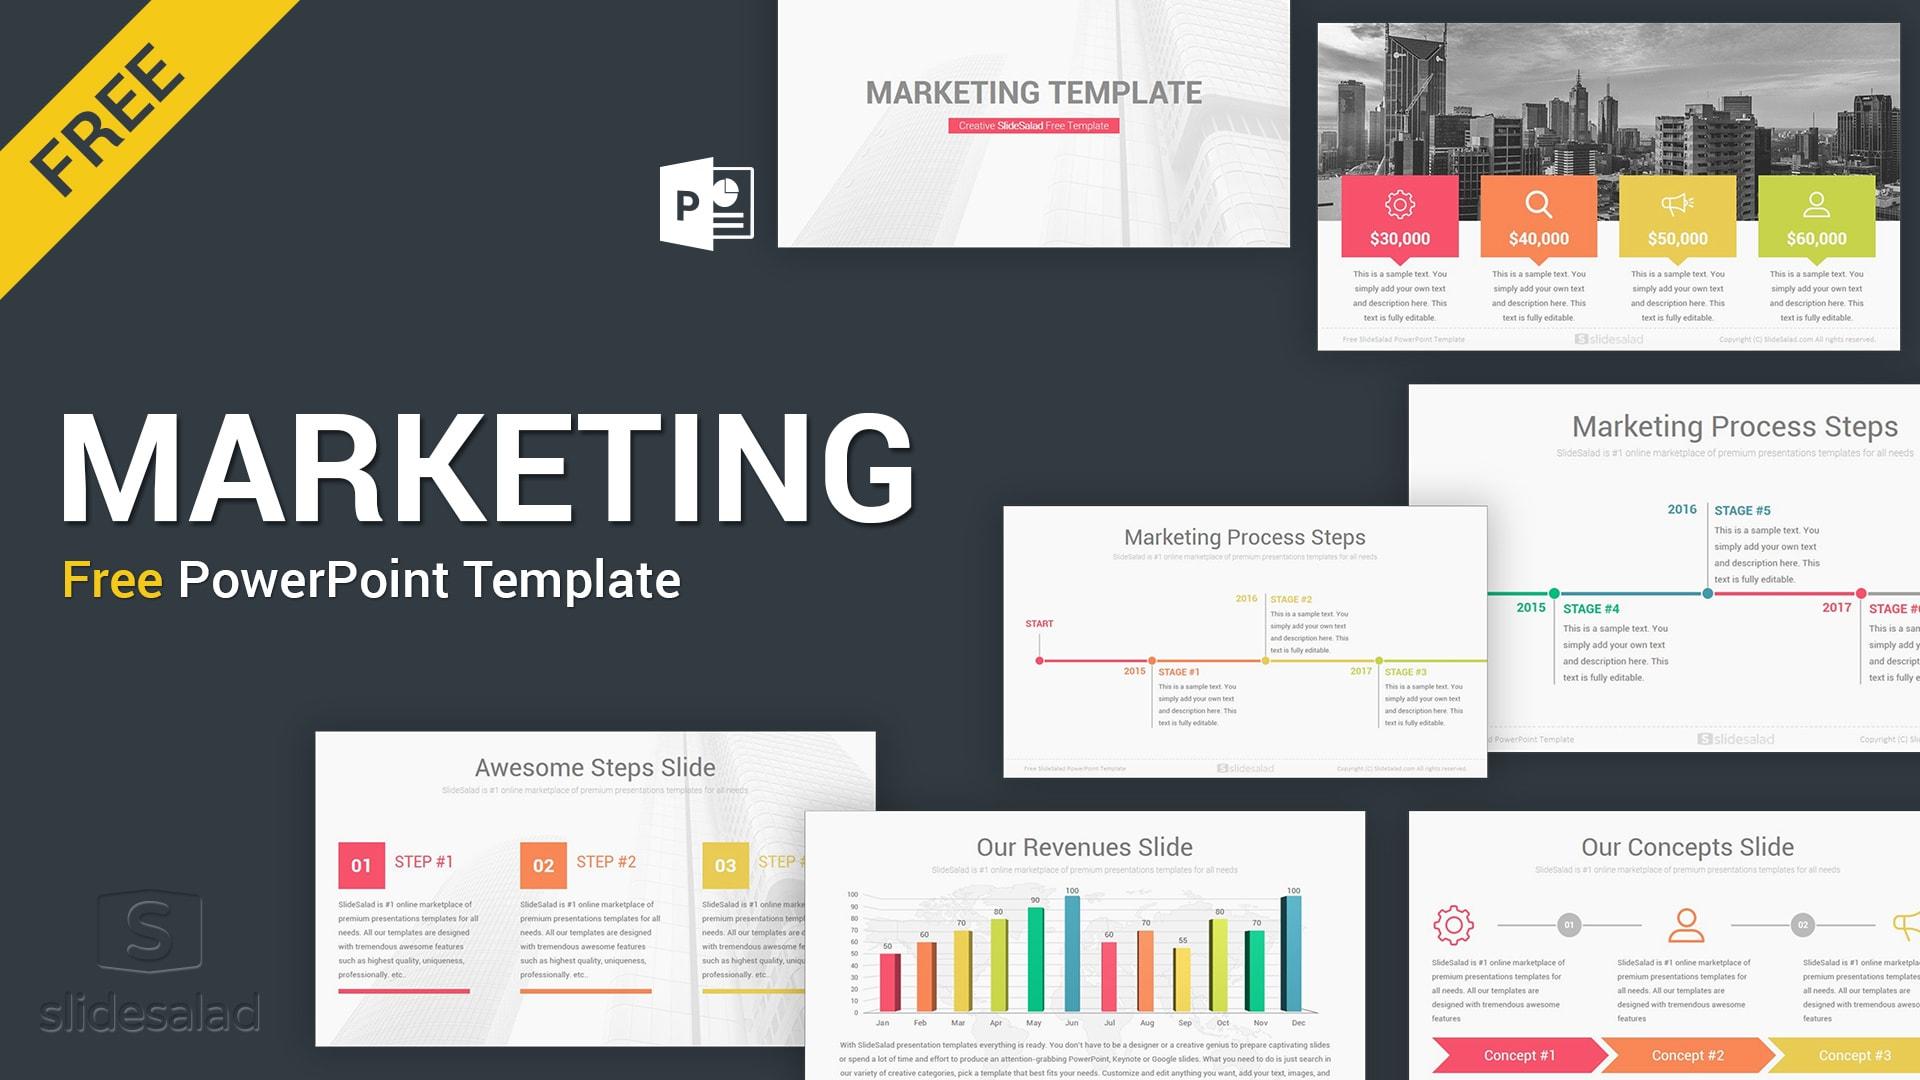 Marketing Free Download Powerpoint Template Slides Slidesalad